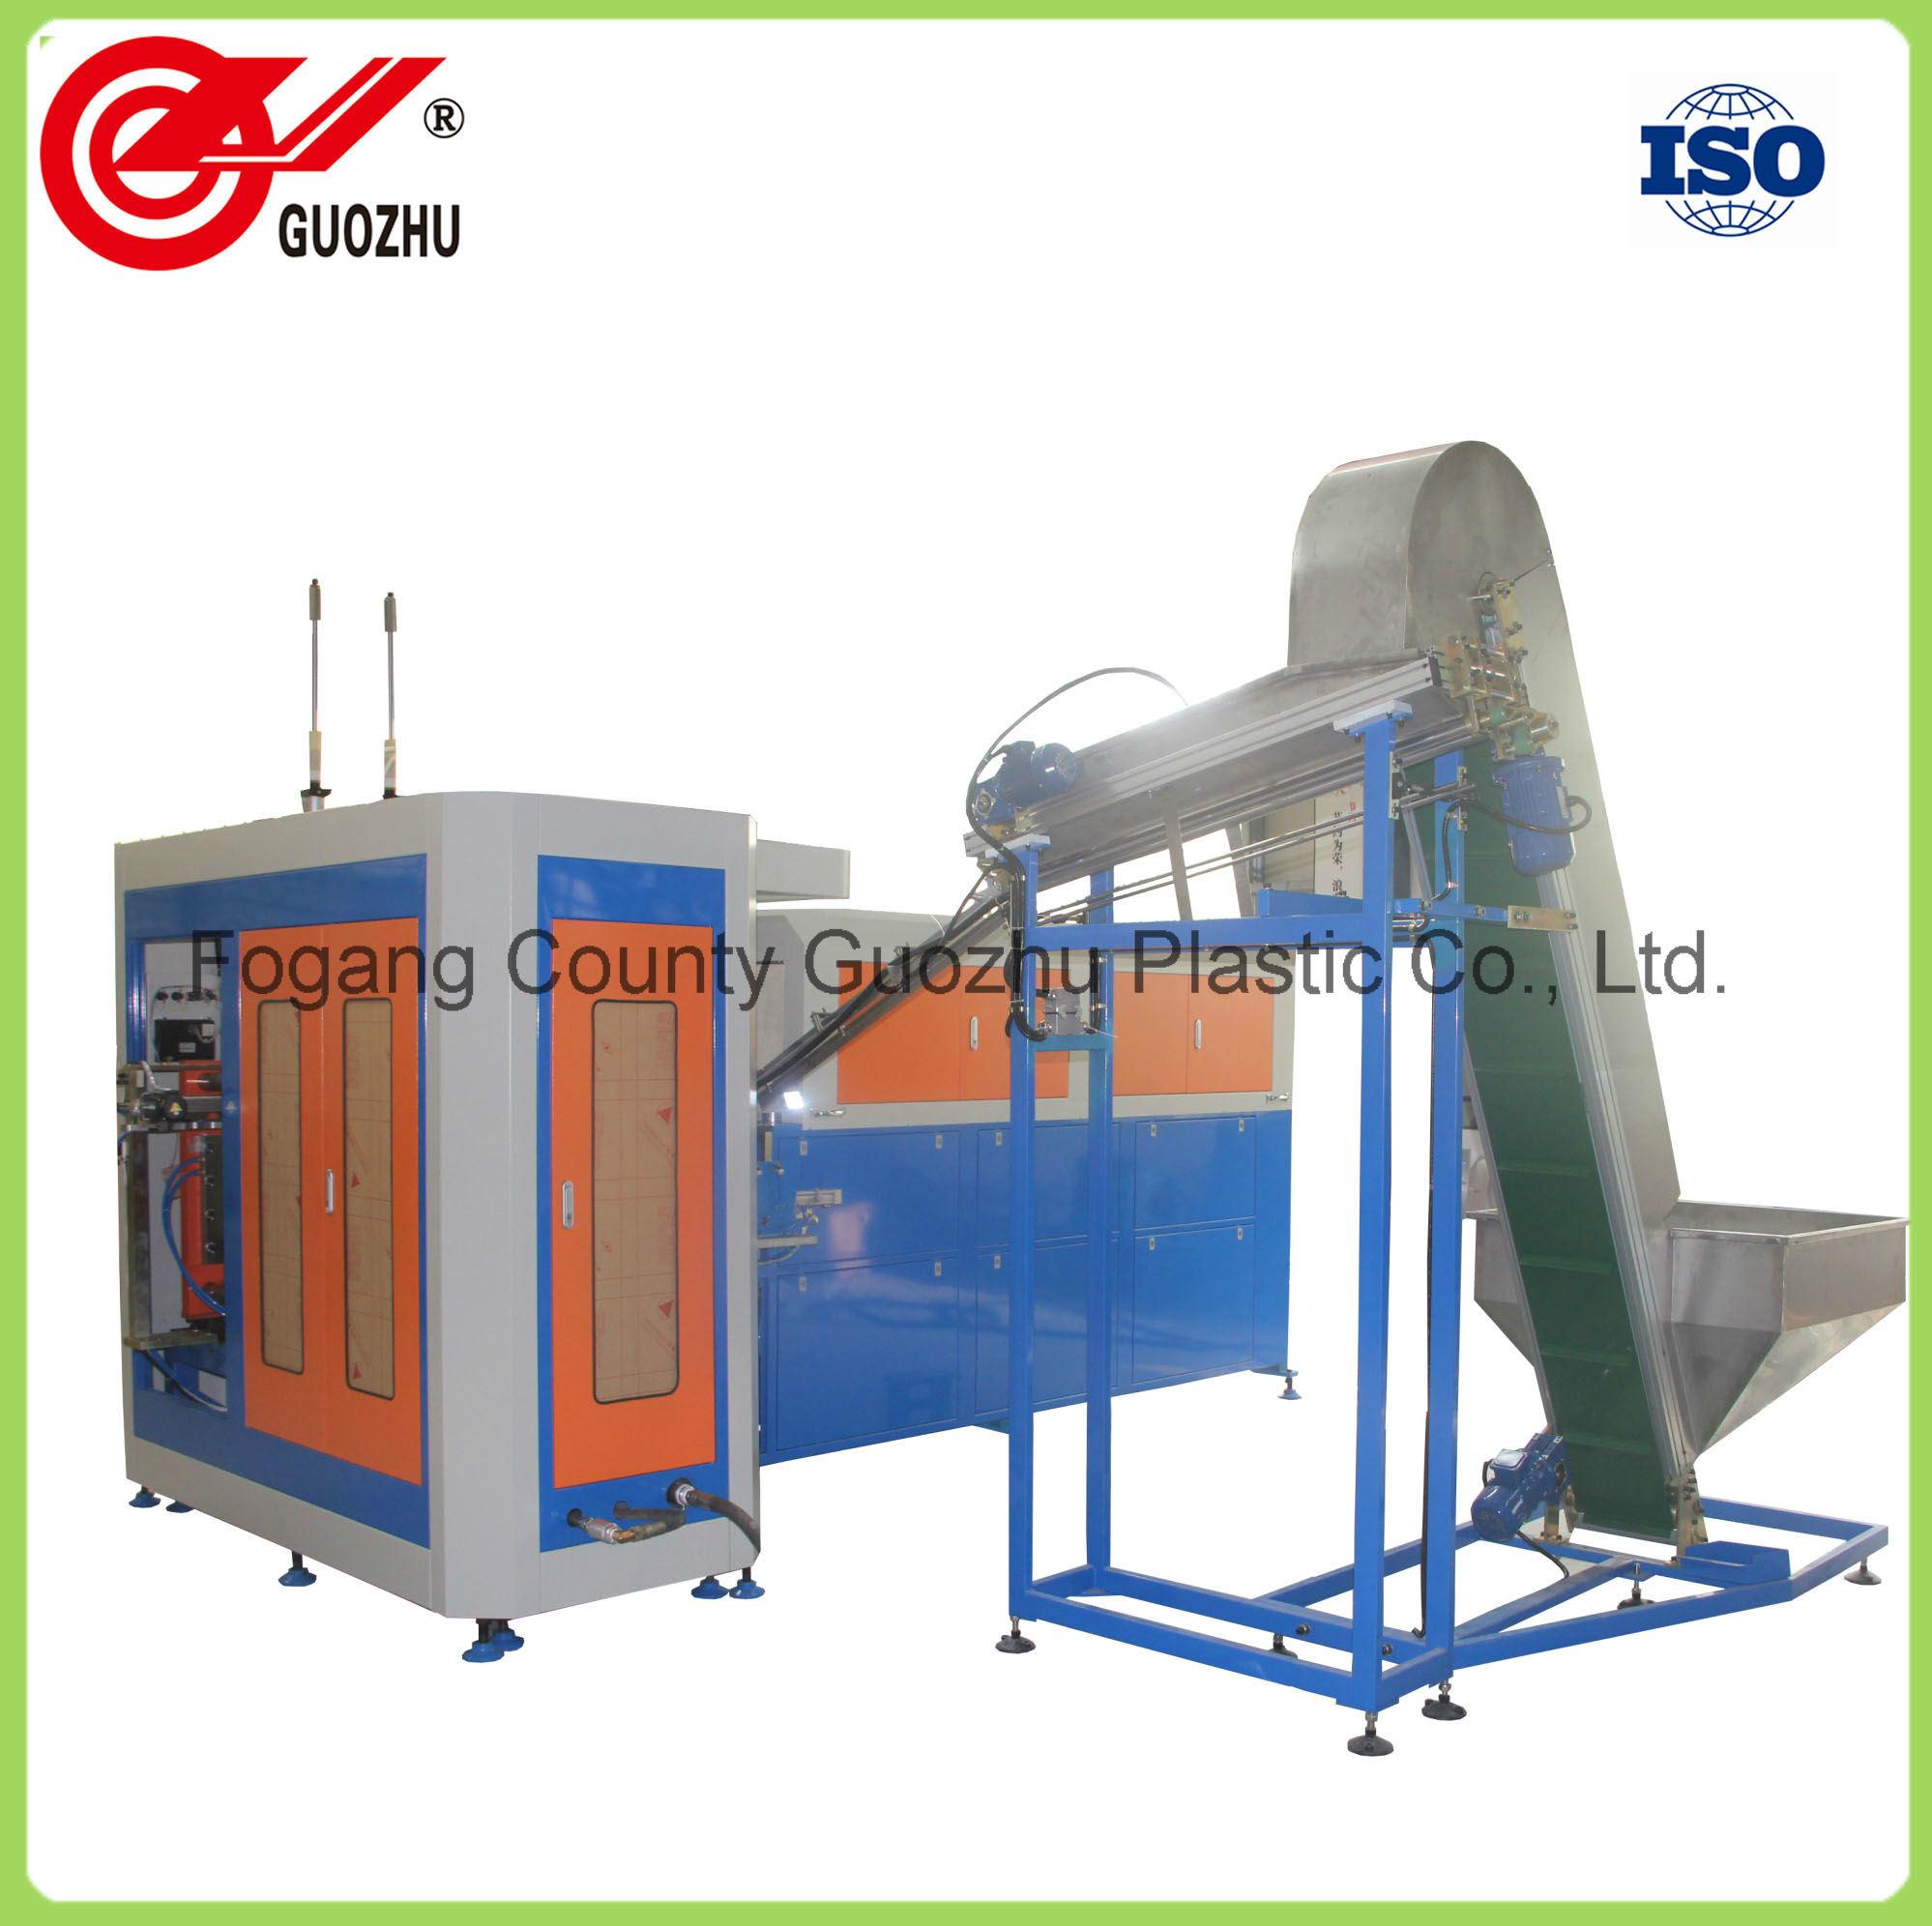 6 Cavity Automatic Linear Blow Molding Machine for 5L Bottle